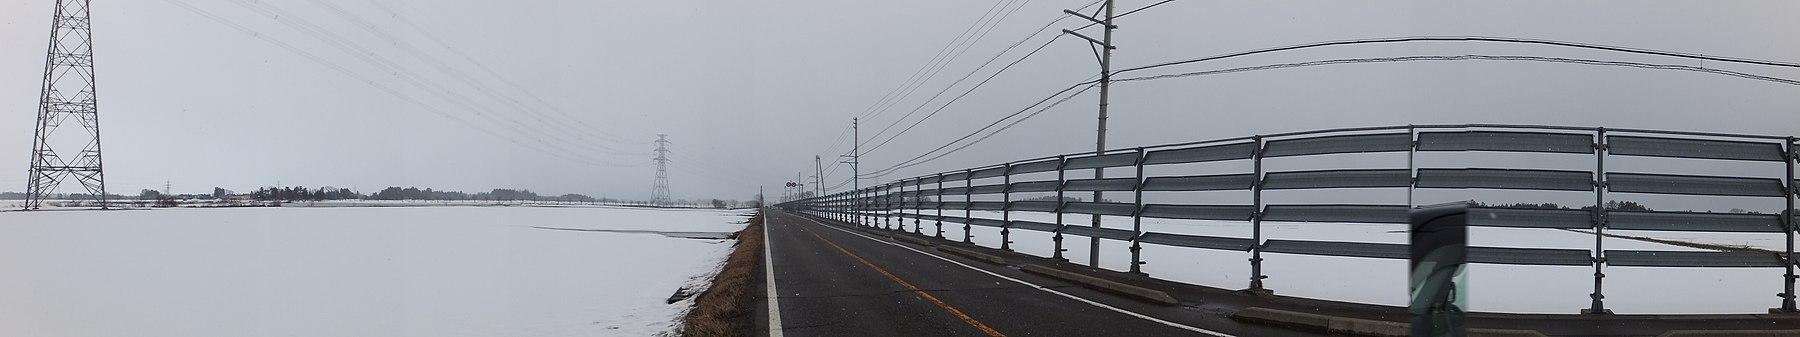 Aono, Joetsu, Niigata Prefecture 942-0238, Japan - panoramio.jpg